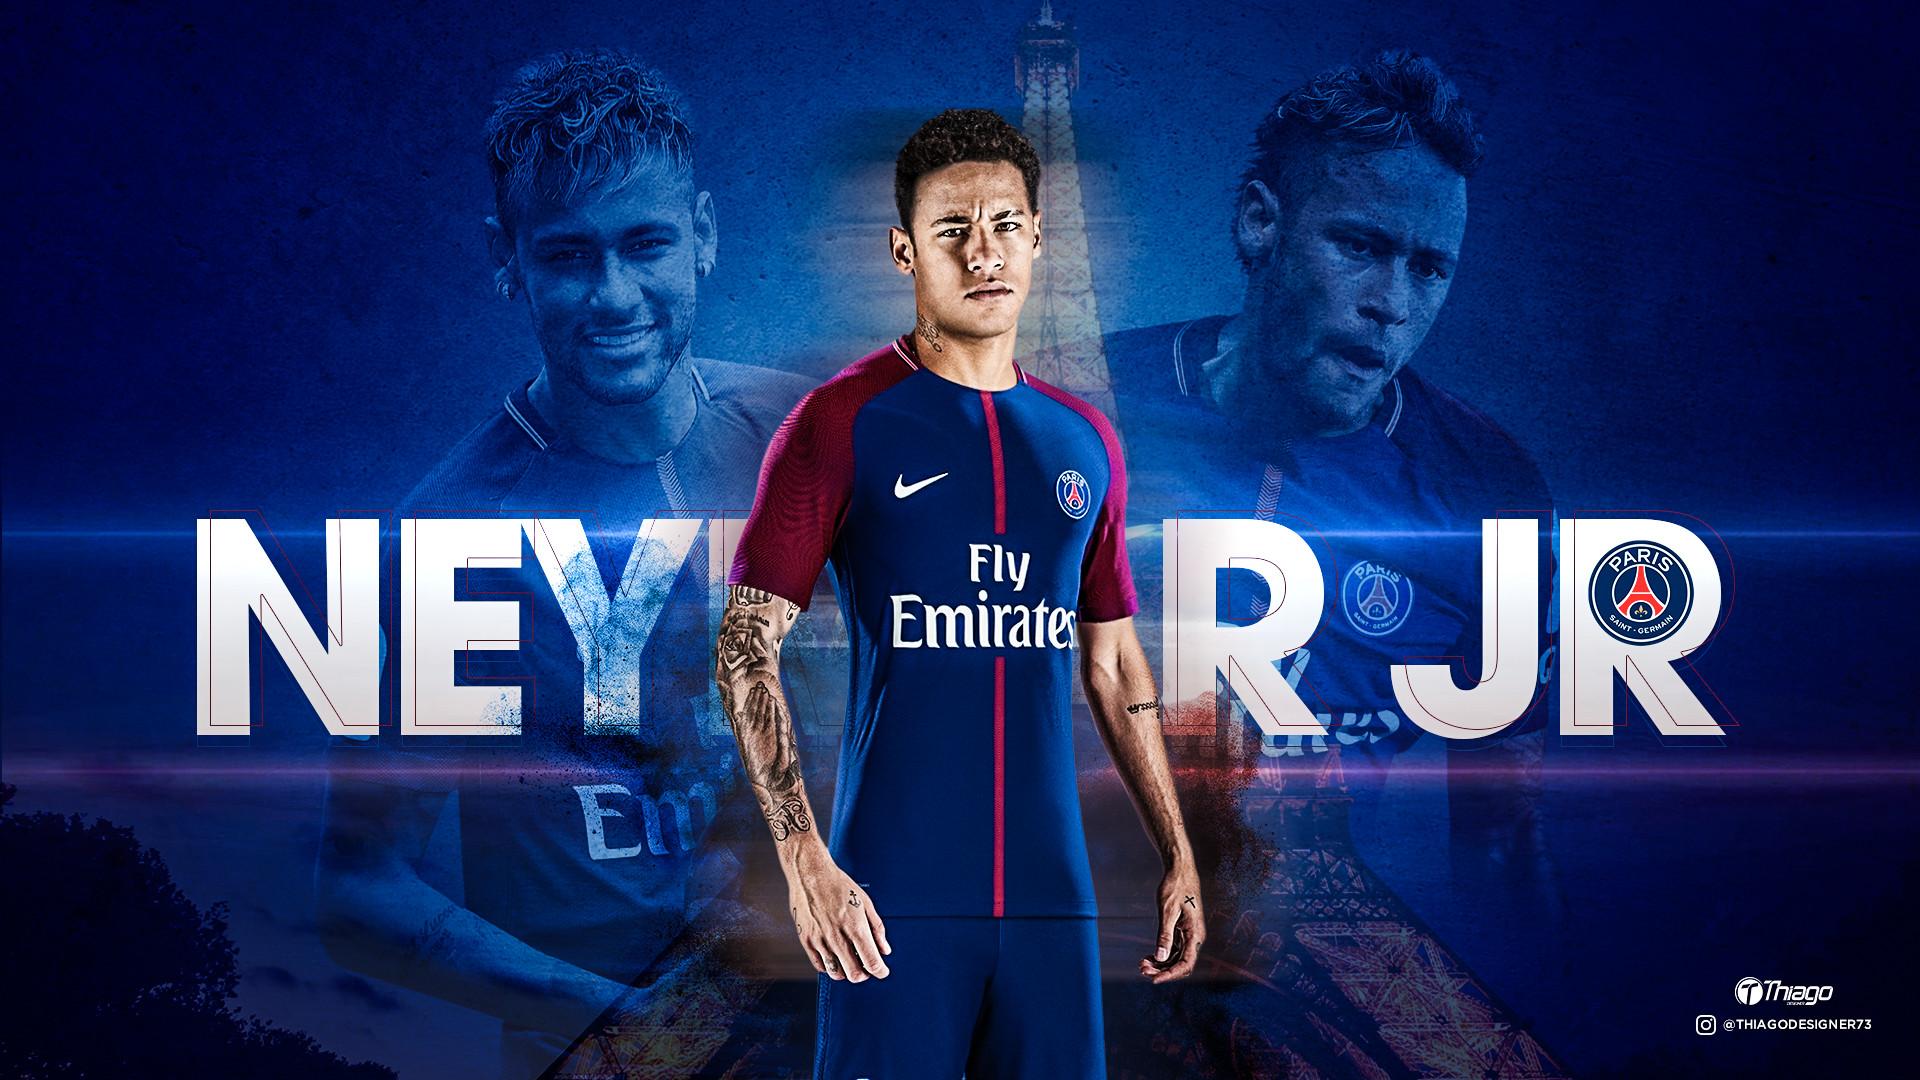 Neymar Jr 2018 Wallpaper 76 Images